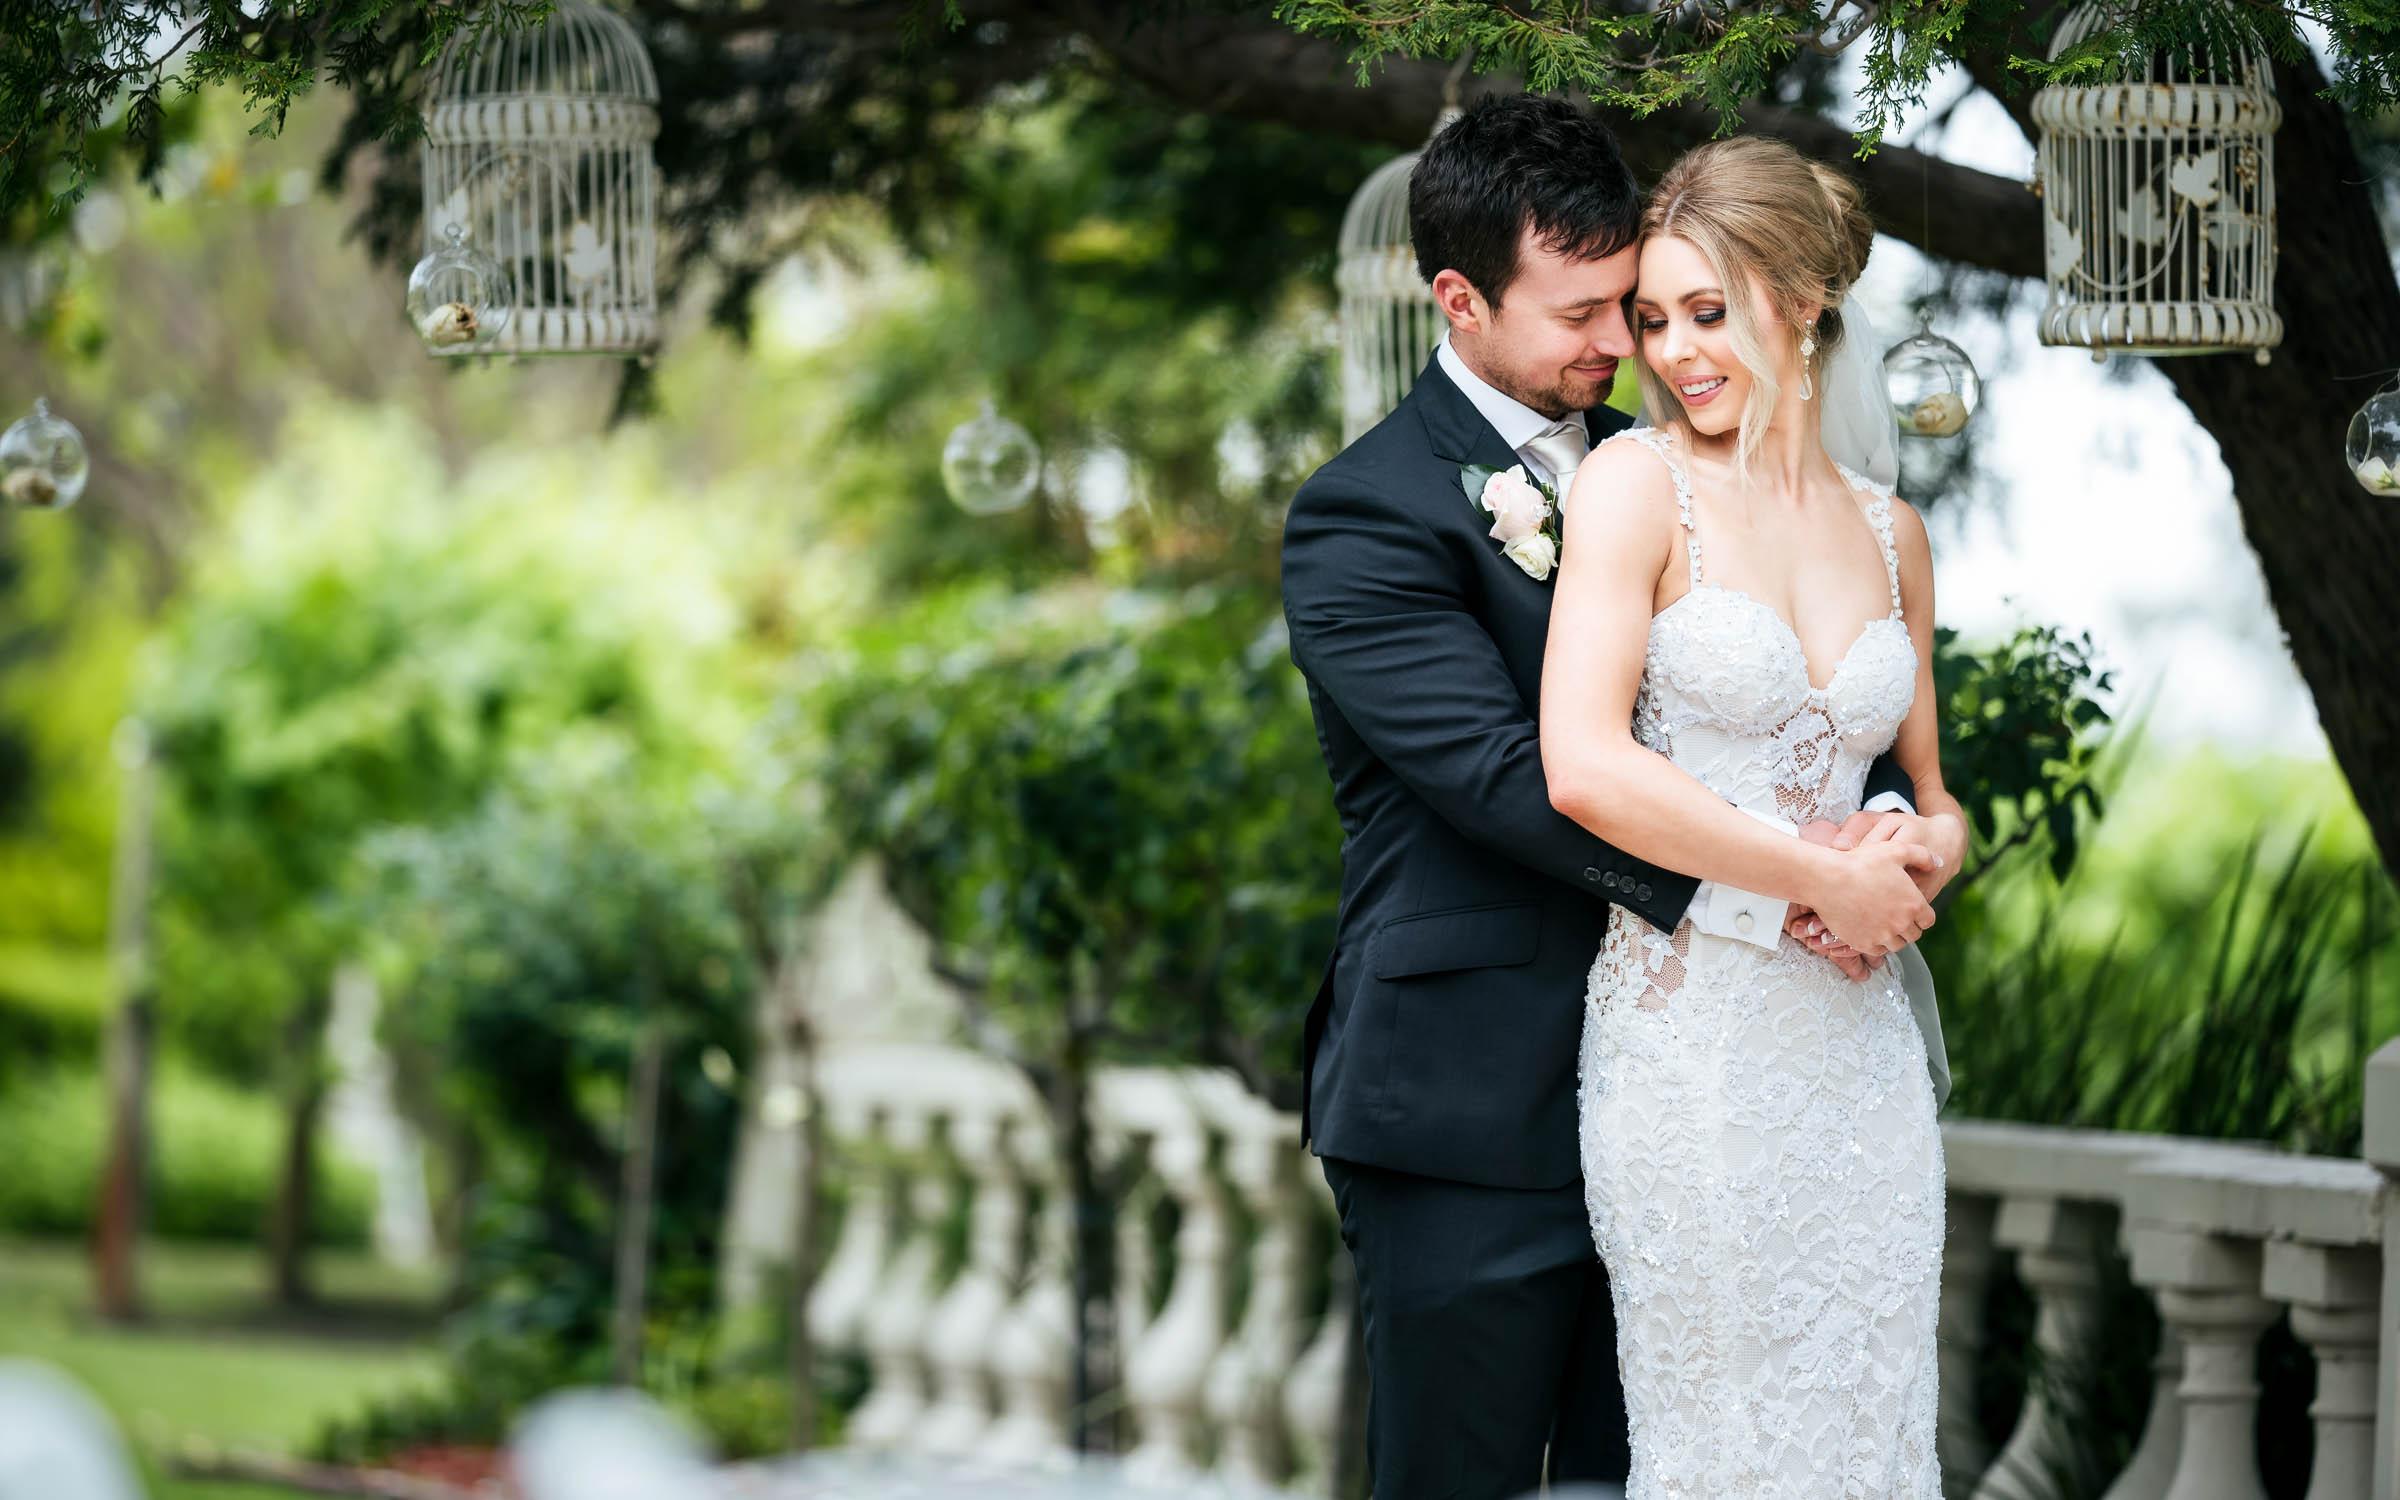 Splendid Photos & Video - Sydney Wedding Photographer